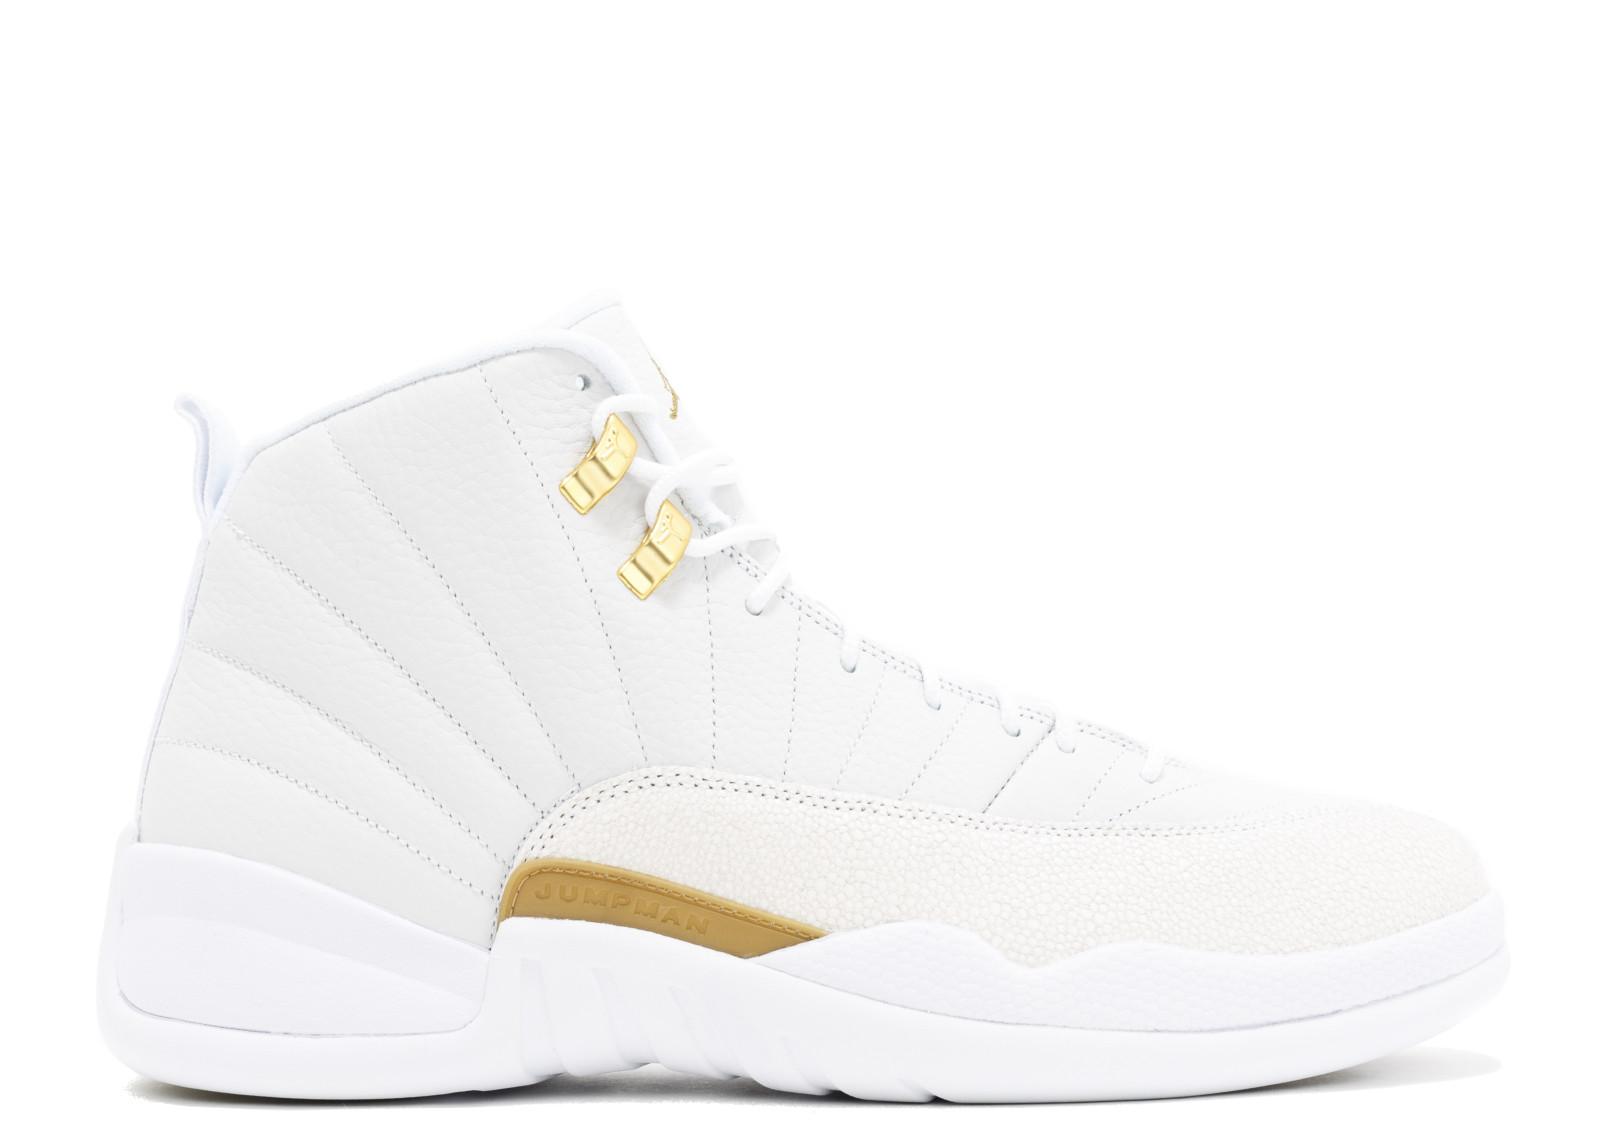 on sale e025f 25ba1 Kick Avenue - Authentic Sneakers